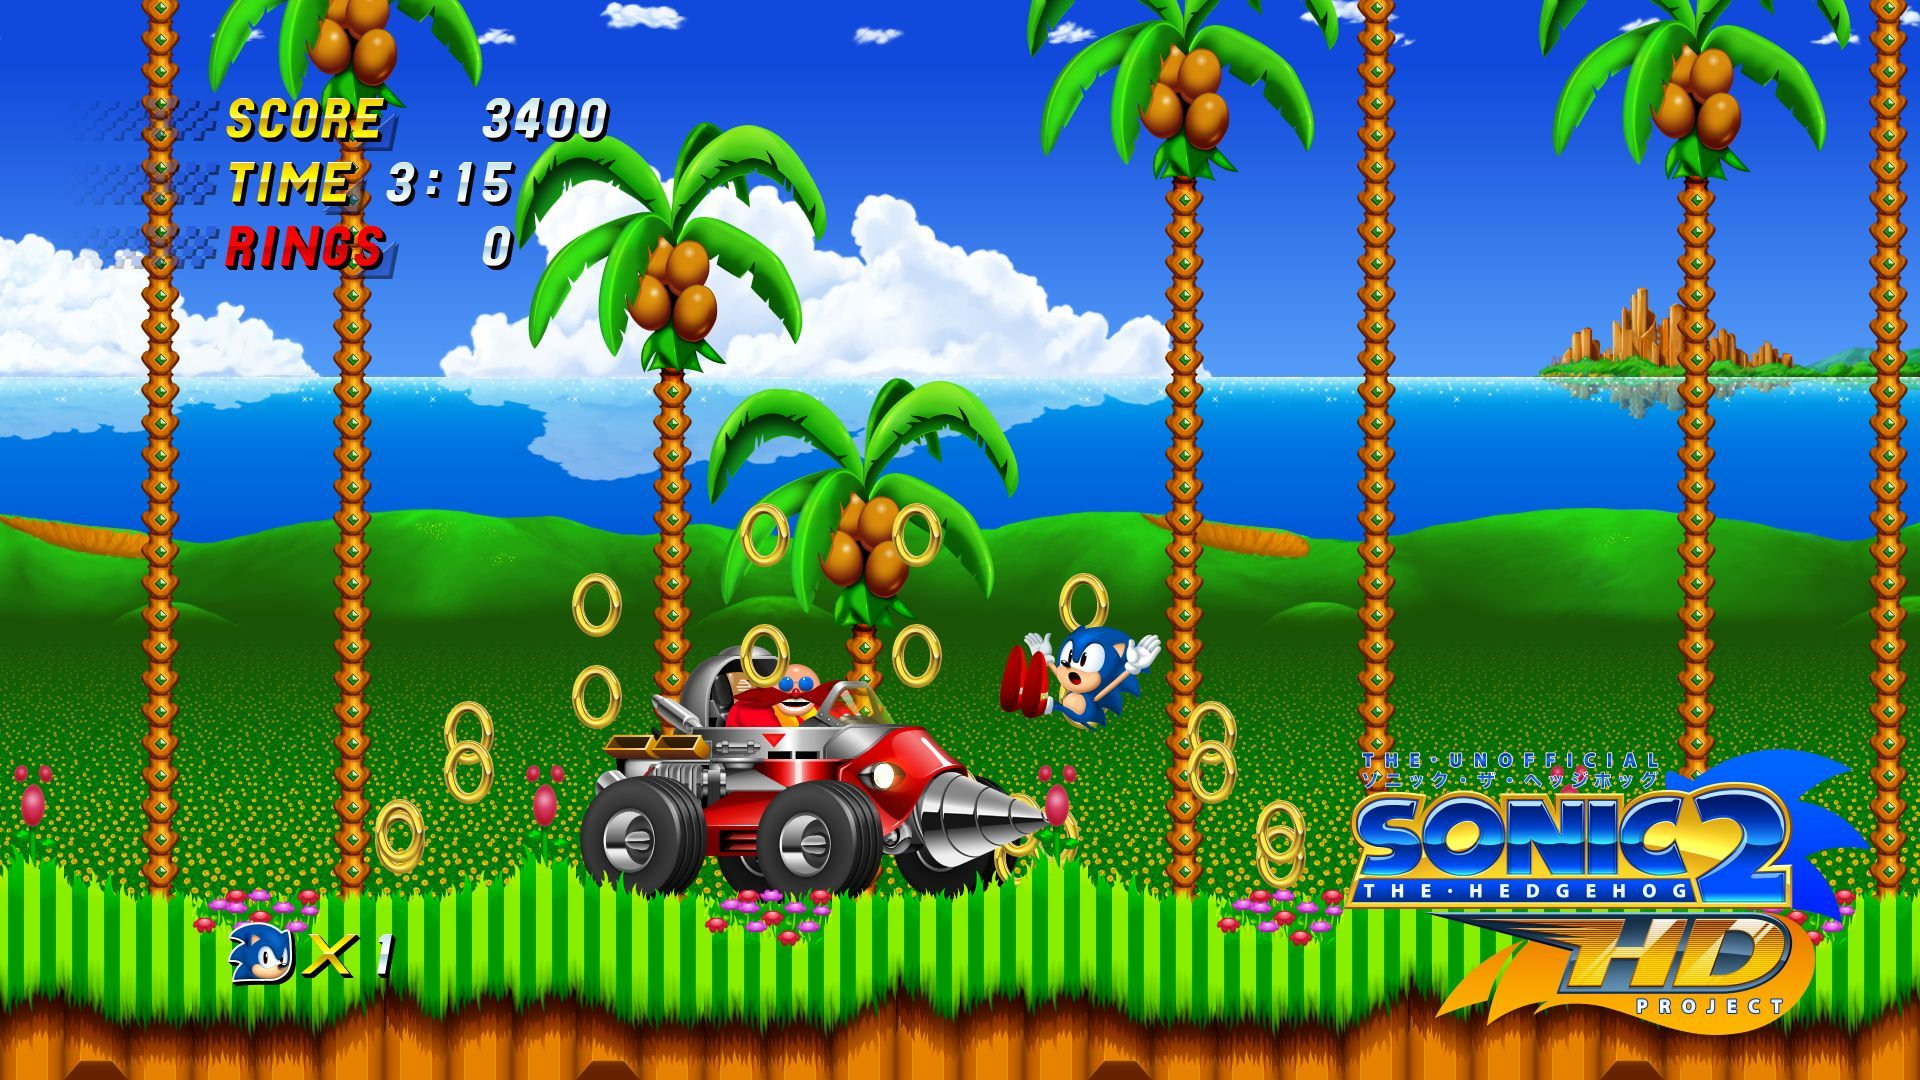 280312 - Sonic 2 HD